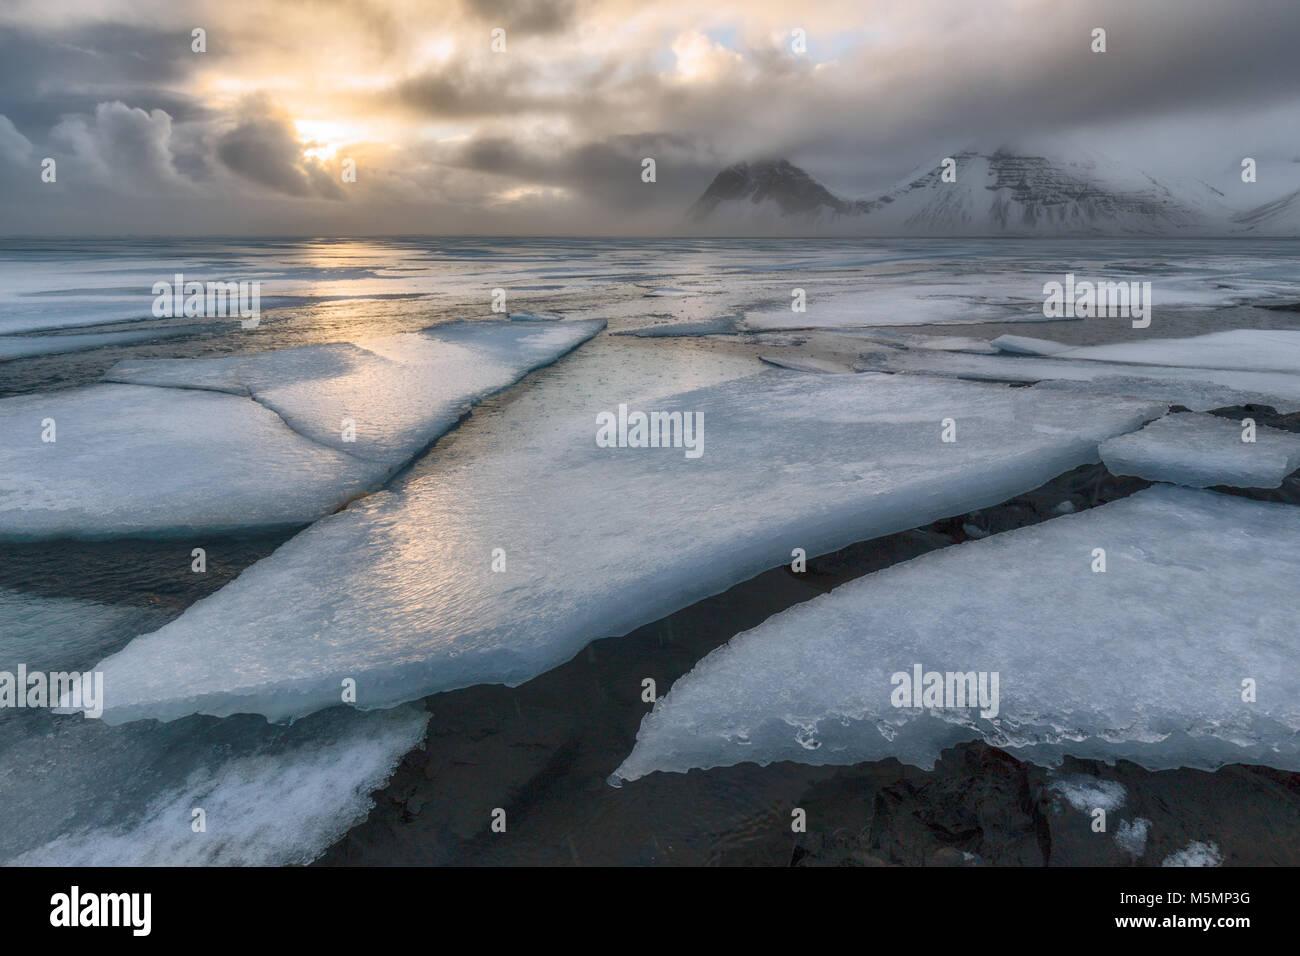 Frozen sea at Vestrahorn in Iceland - Stock Image